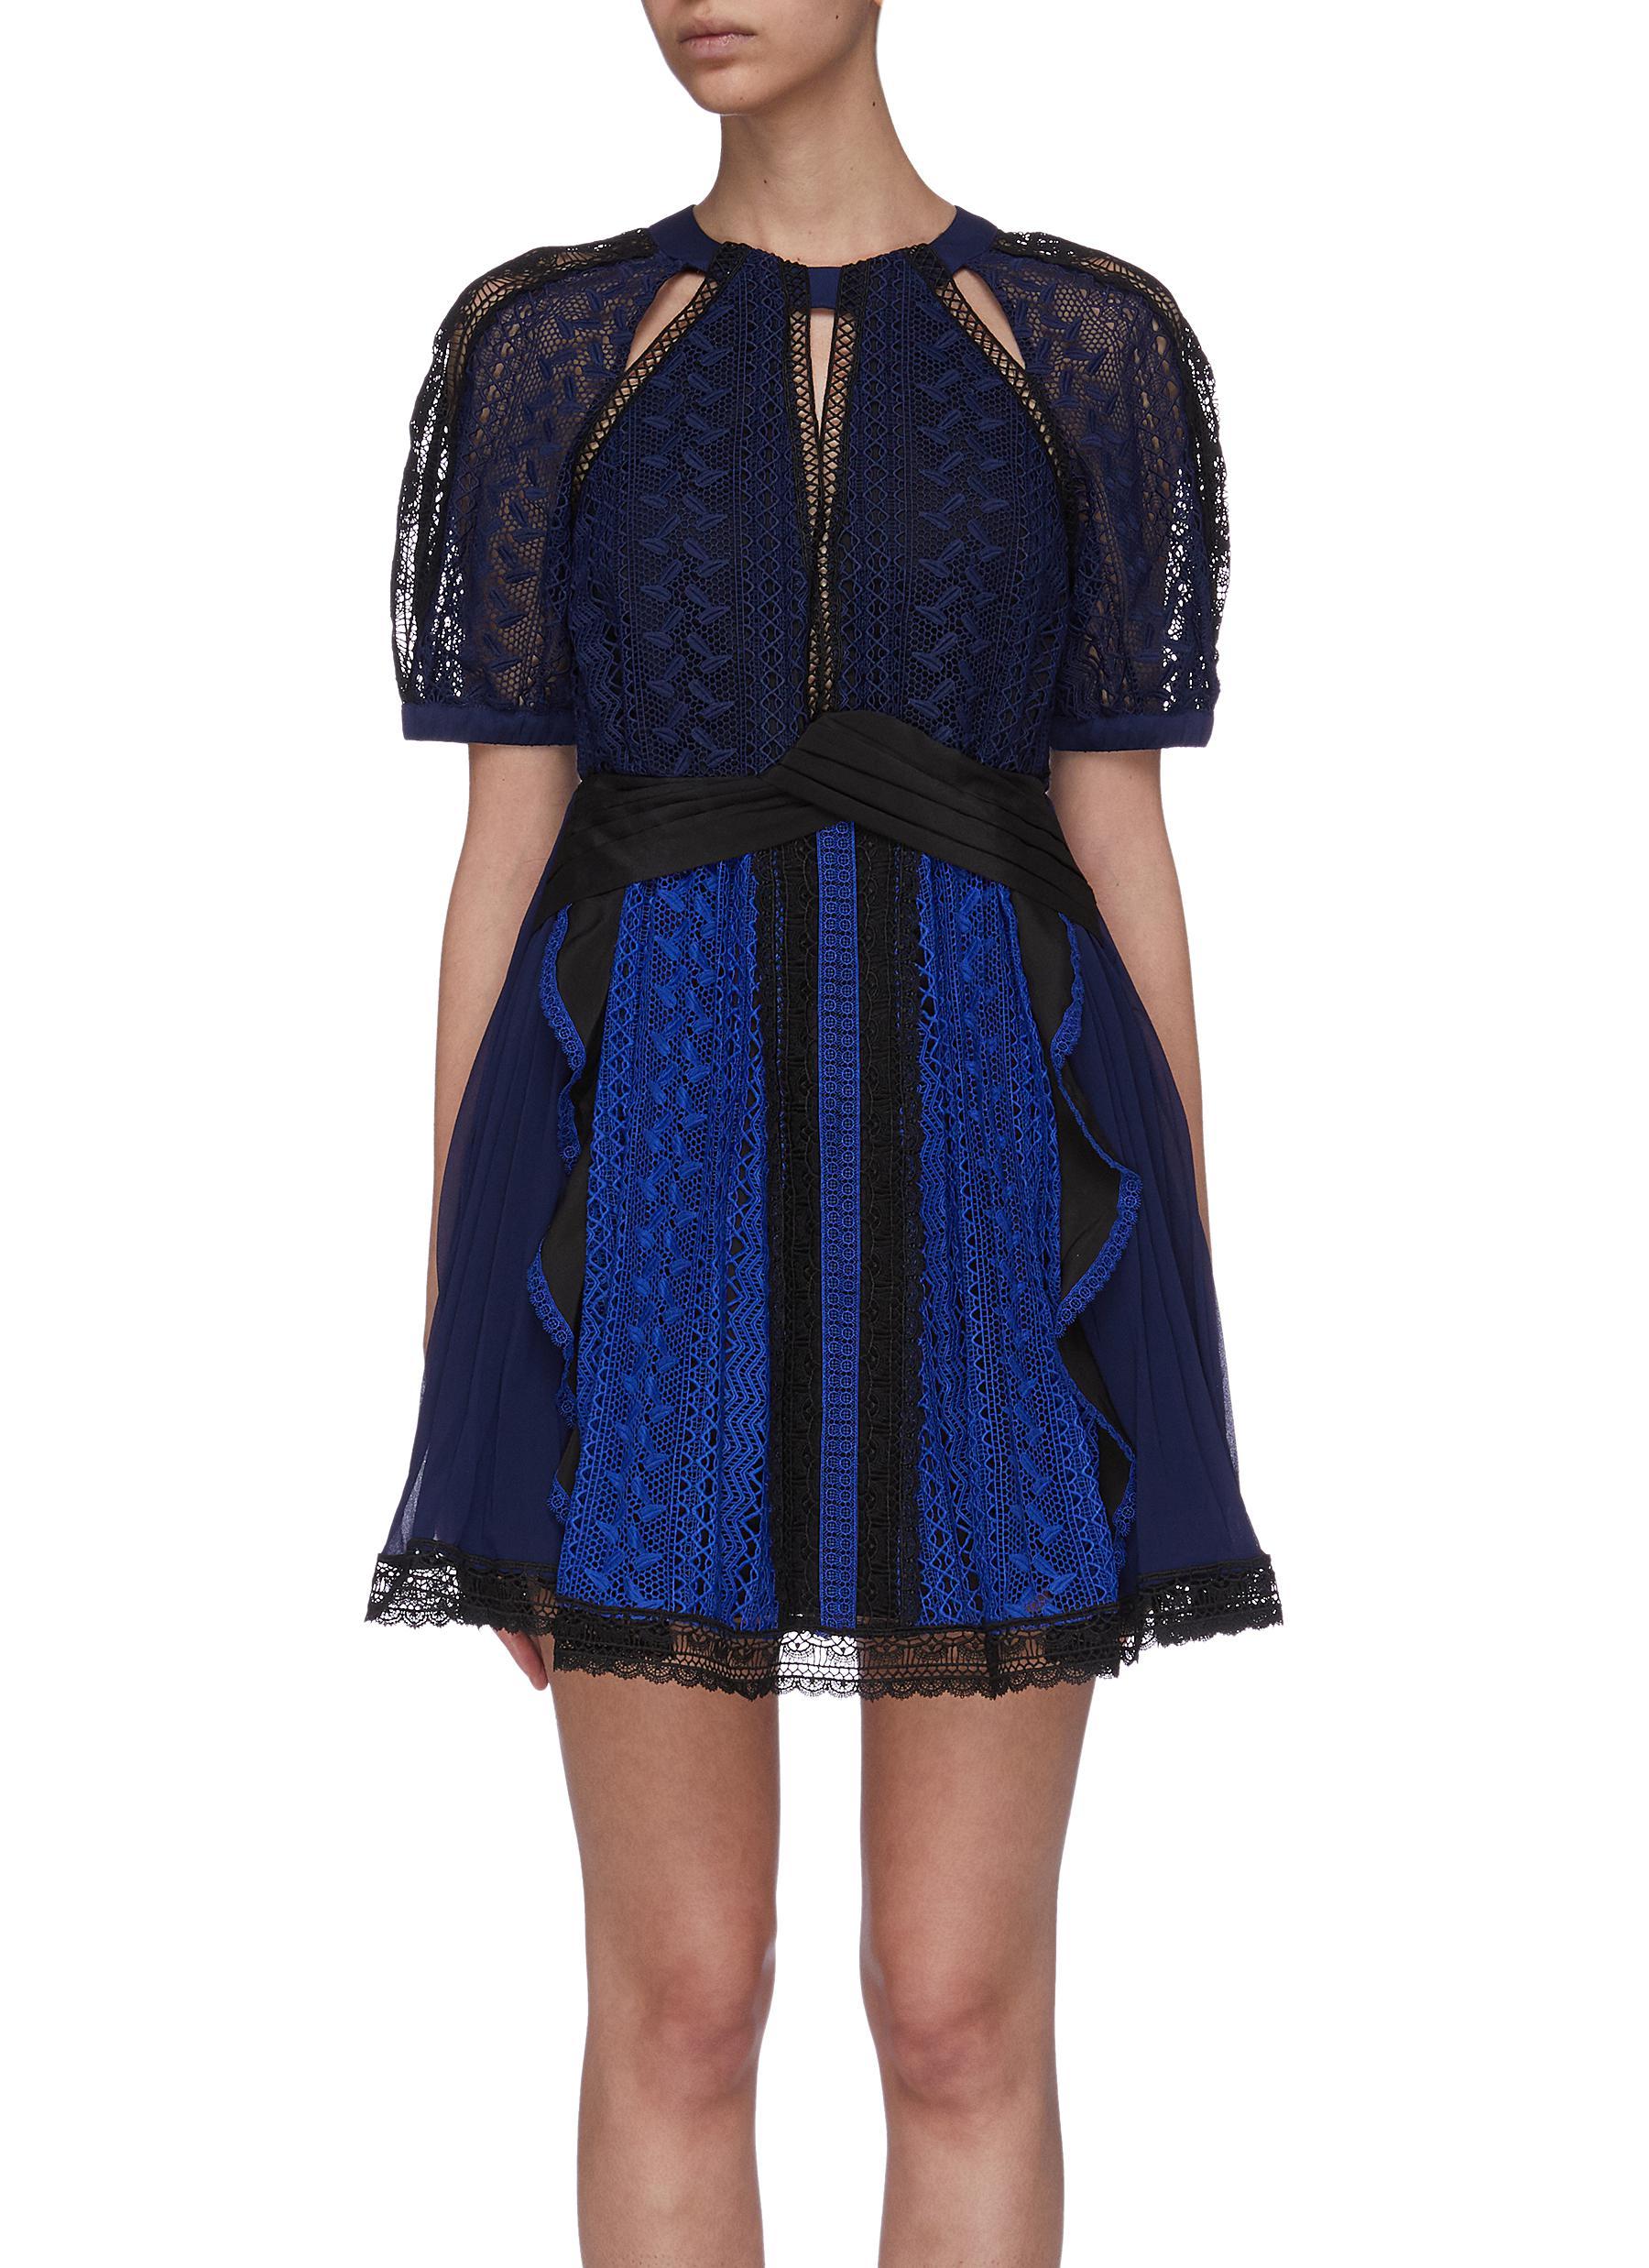 Puff sleeve ruffle lace dress by Self-Portrait